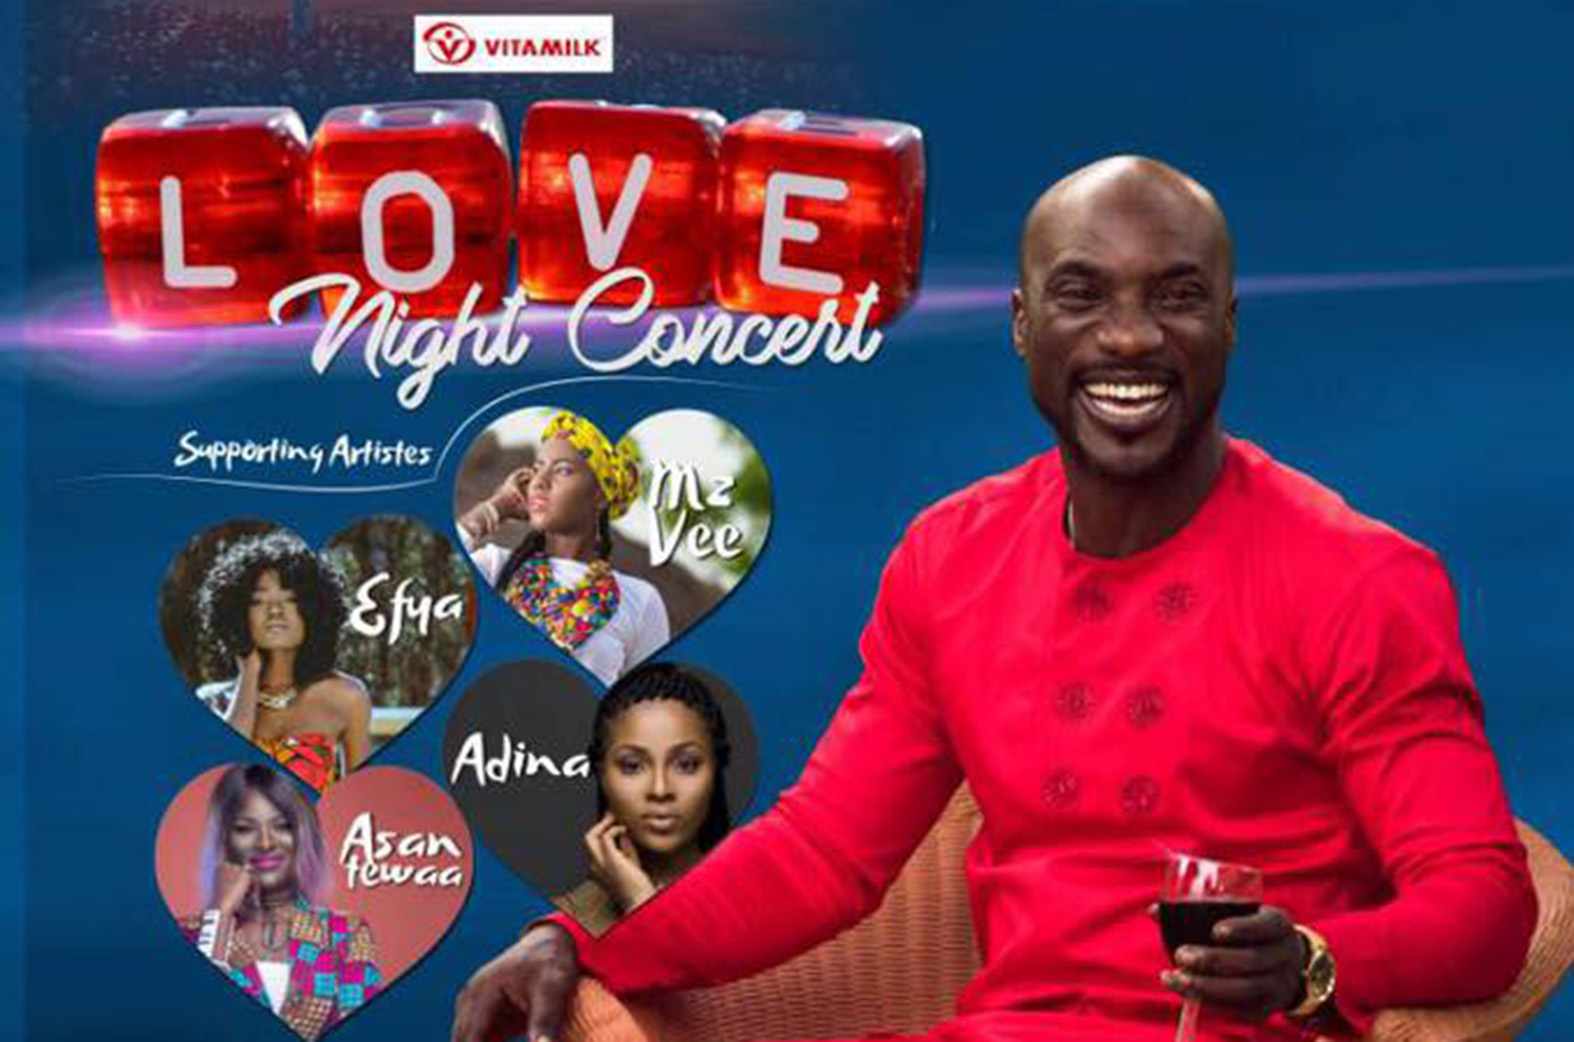 Kwabena Kwabena to host Love Night Concert